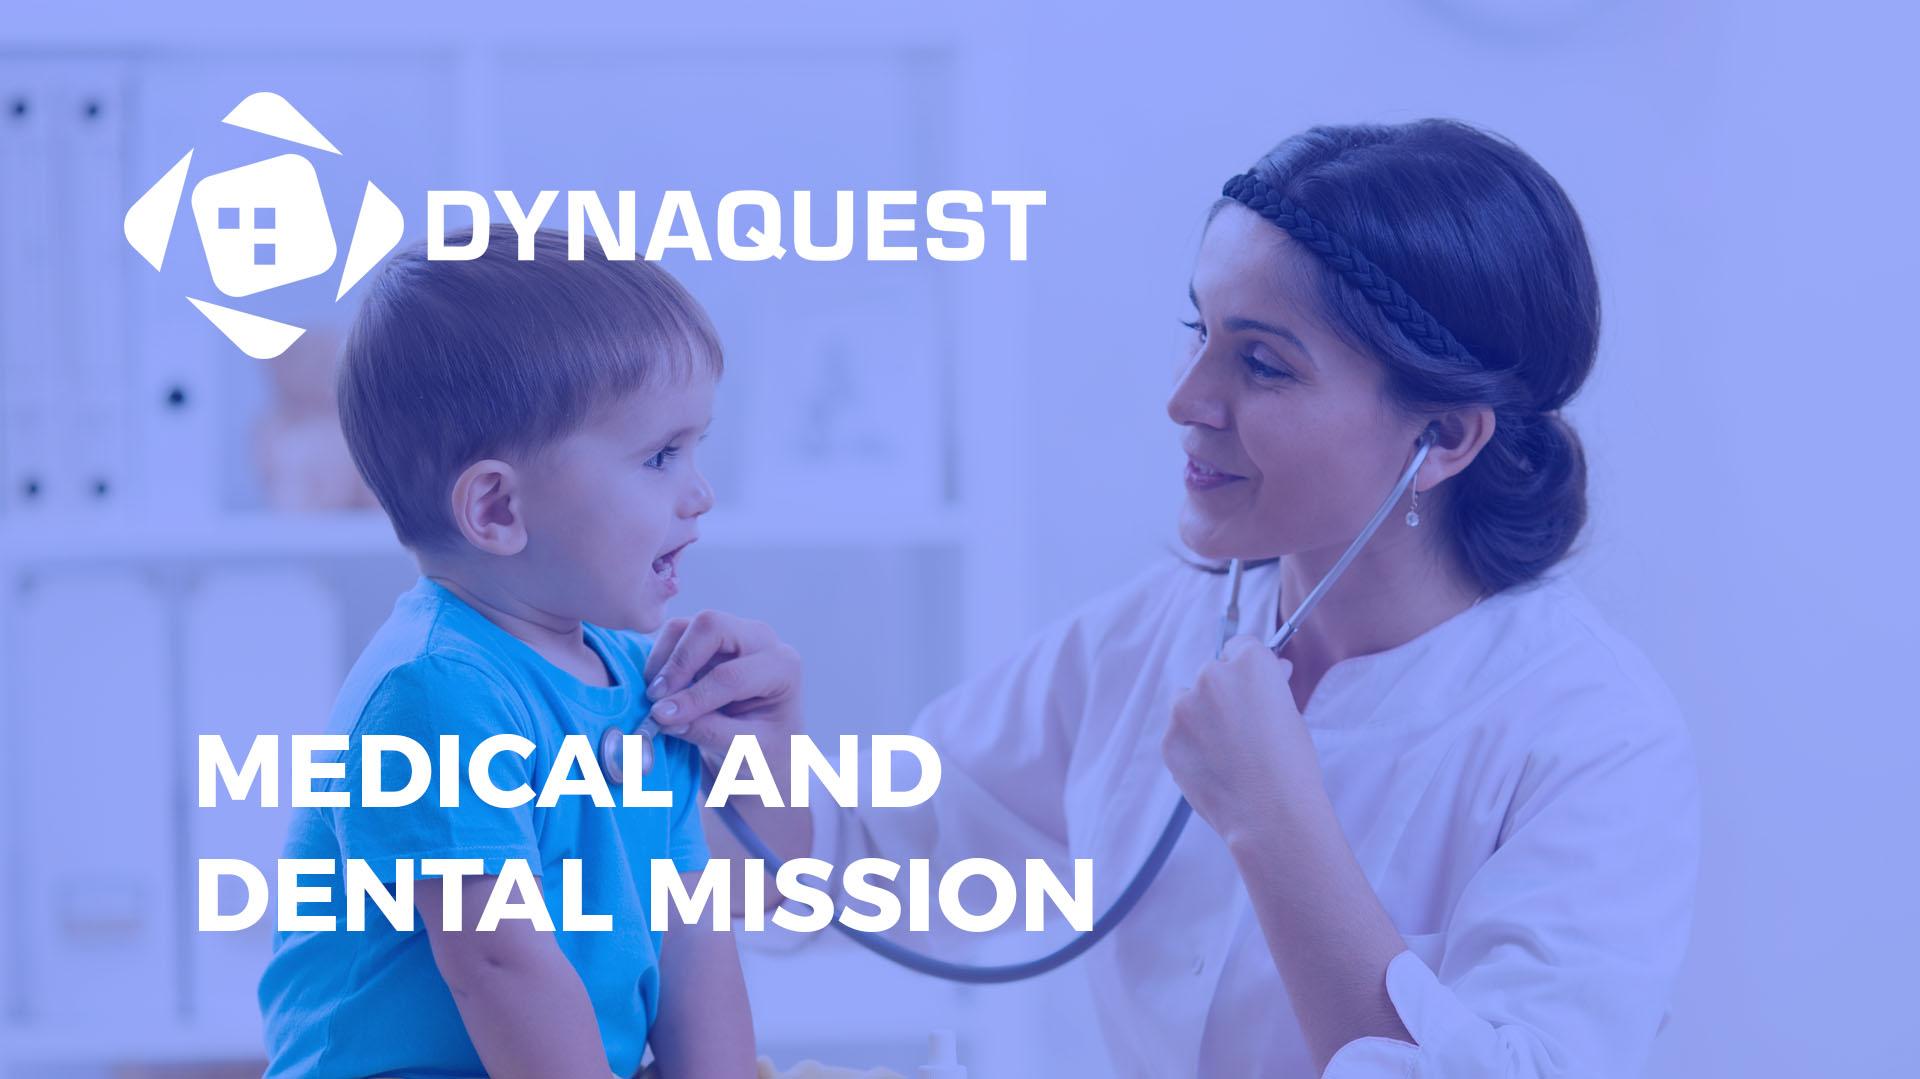 dynaquest medical and dental mission